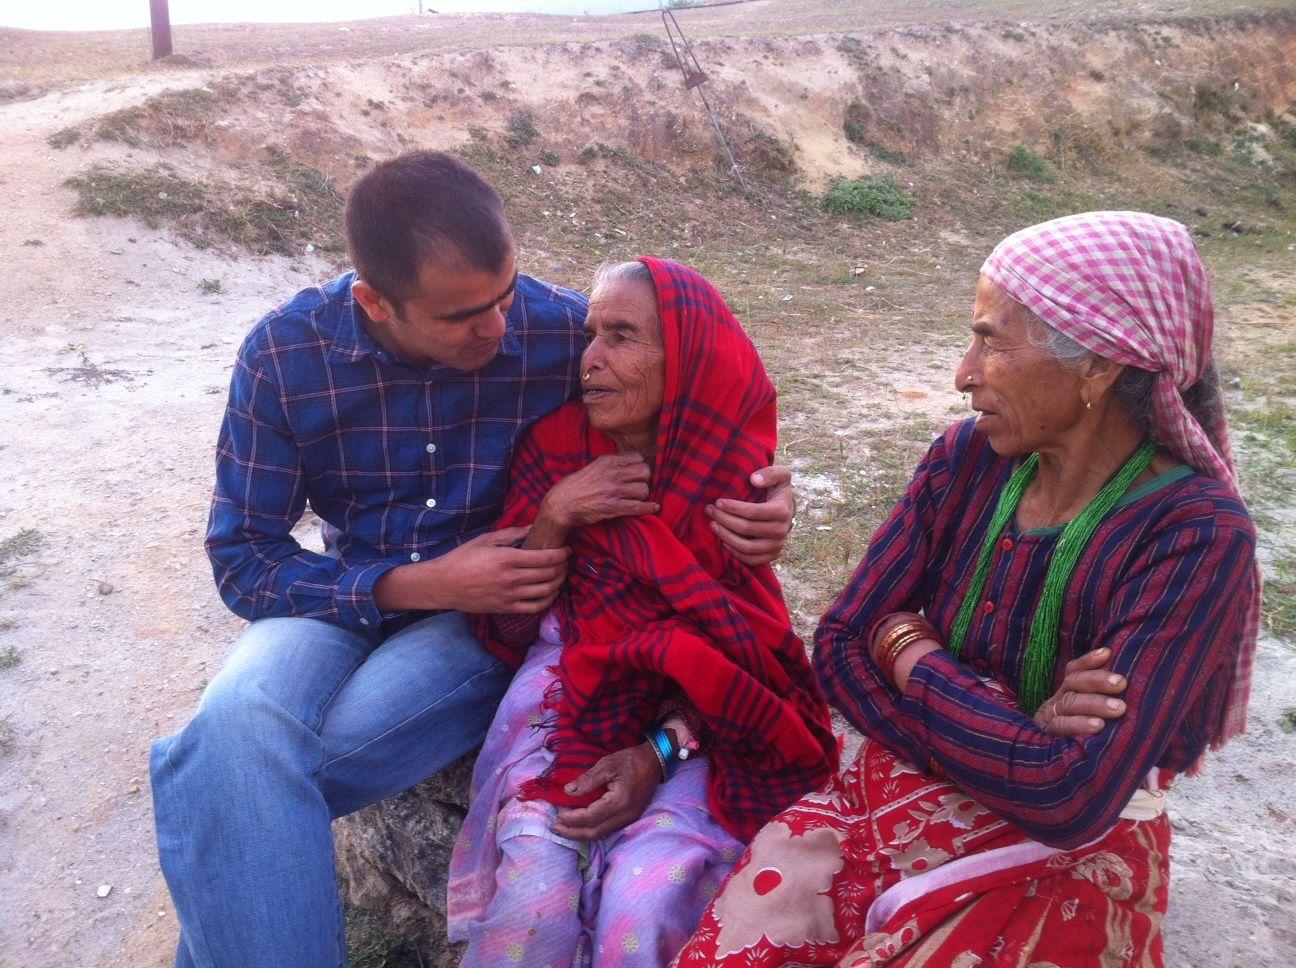 Mark Arnoldy, Nyaya Health We partner with Nepal's